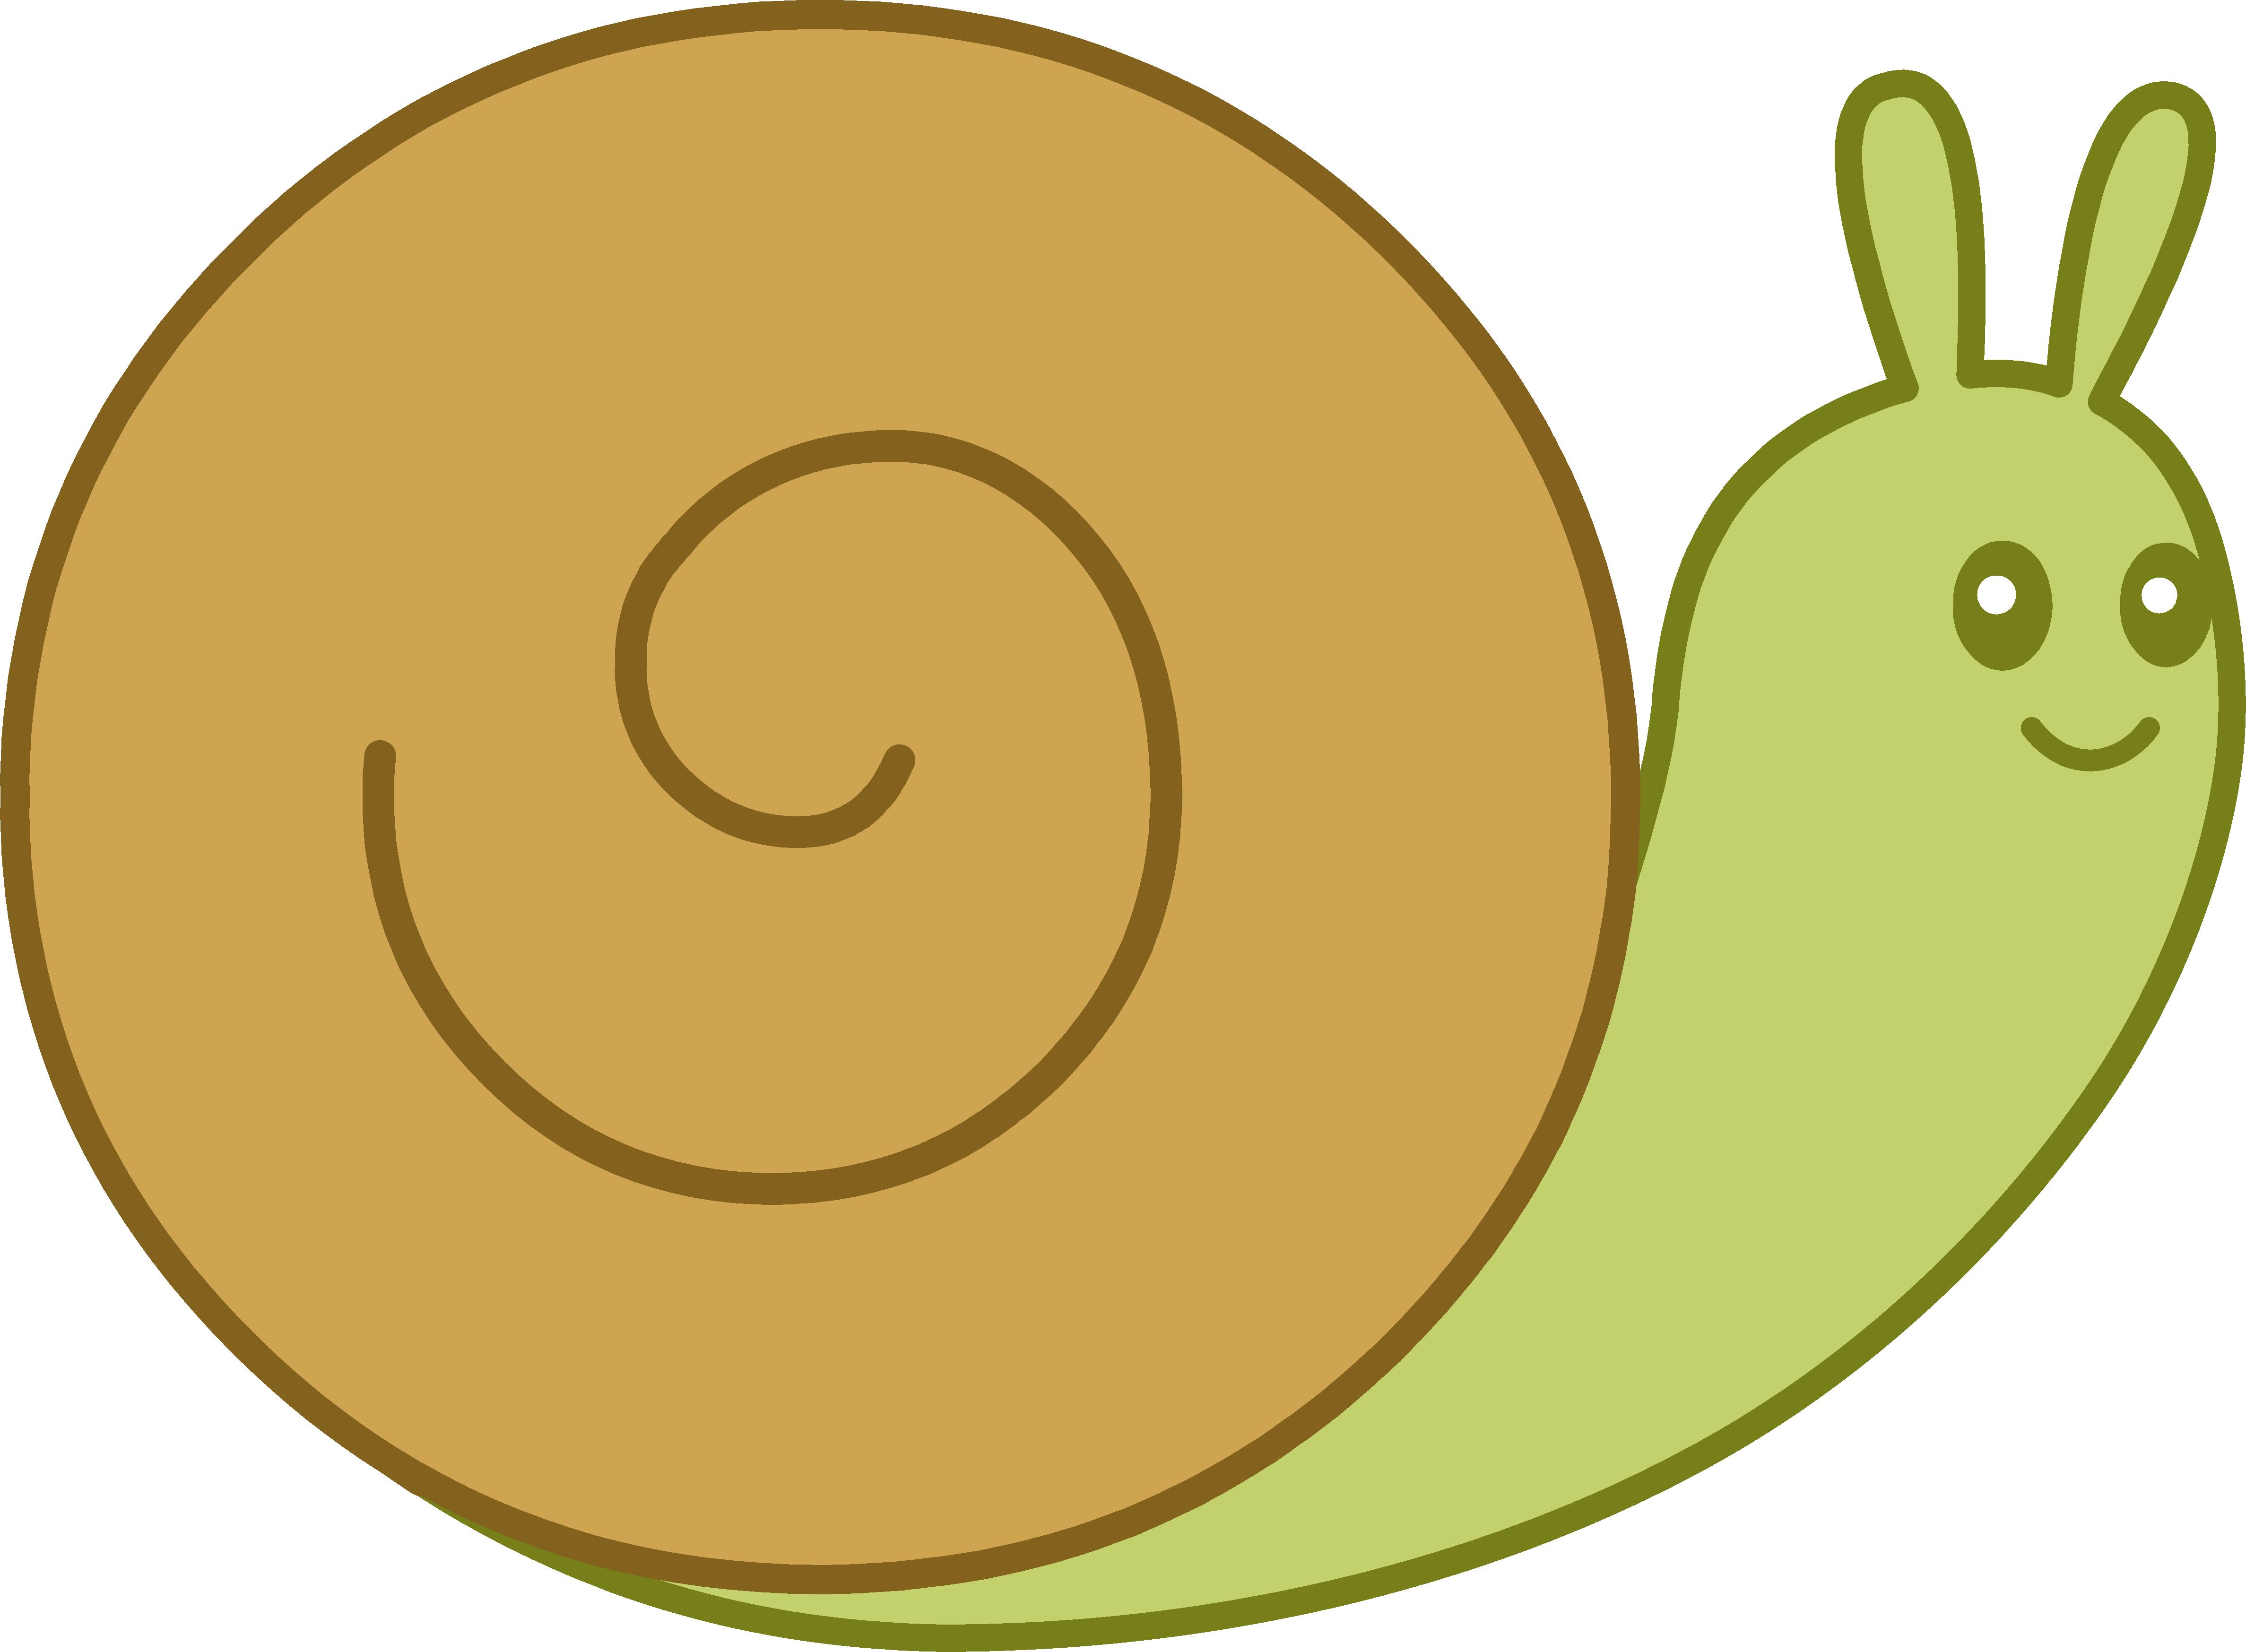 Shell clipart shell snail. Cartoon green free image